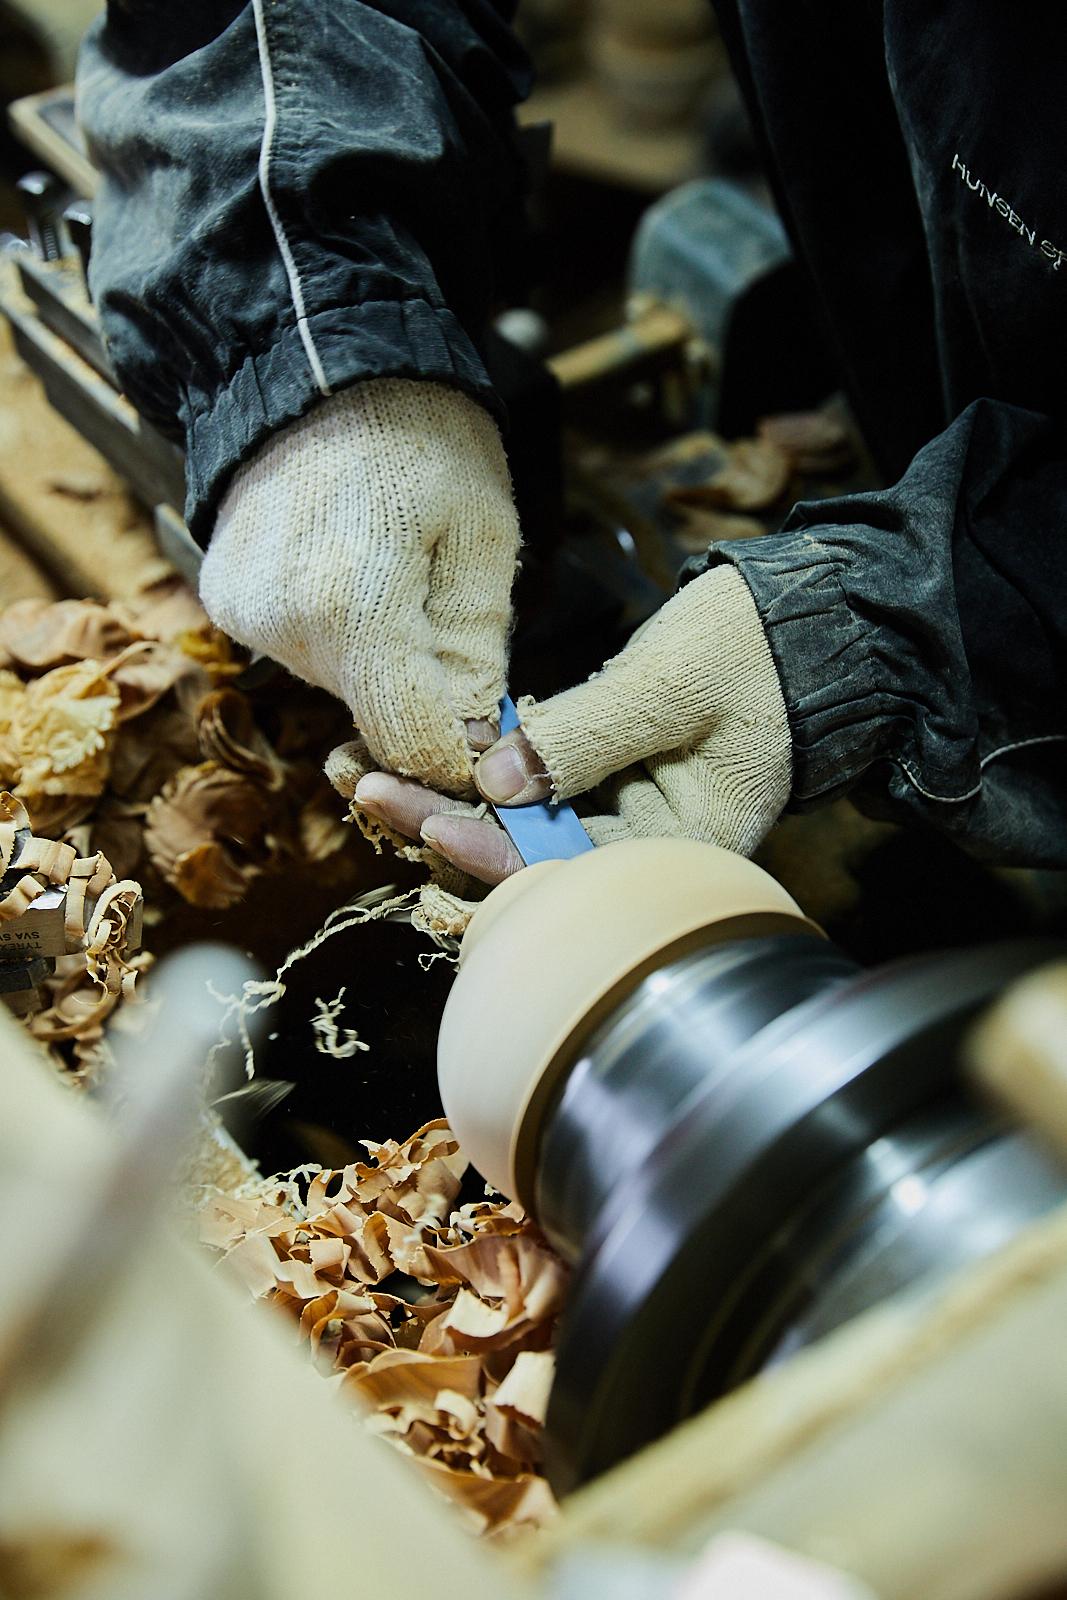 woodworking factory - 32.jpg